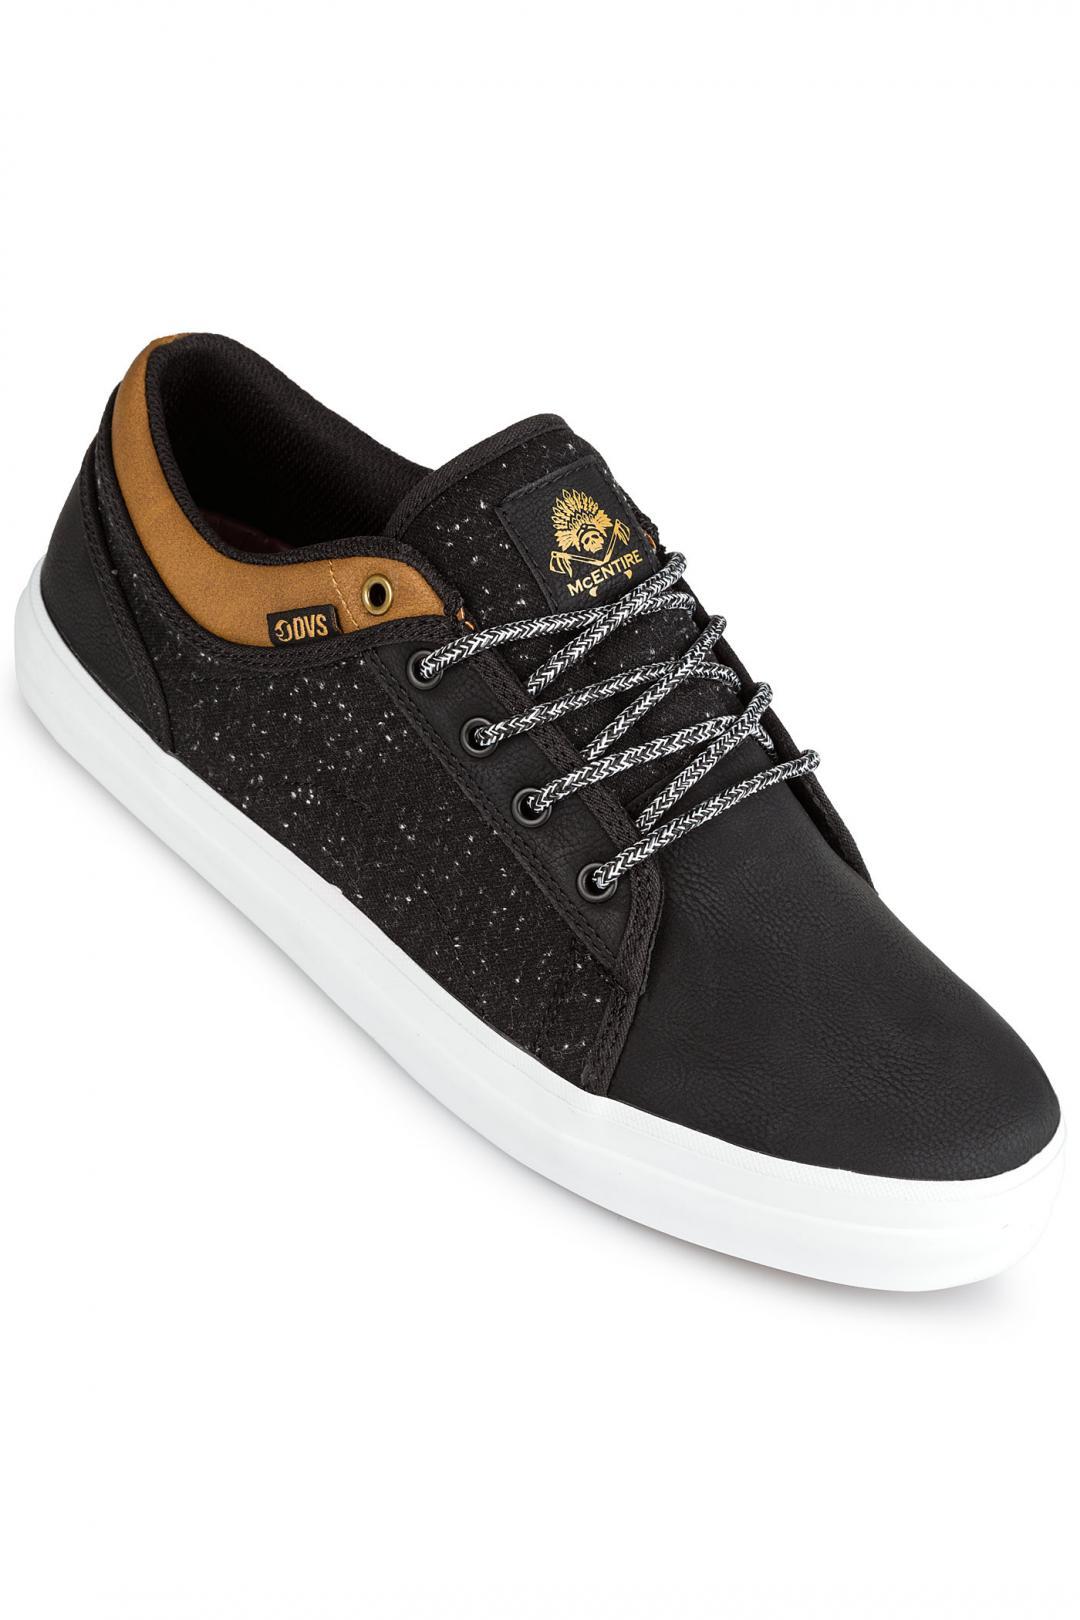 Uomo DVS Aversa black grainy brown mcentire | Sneakers low top